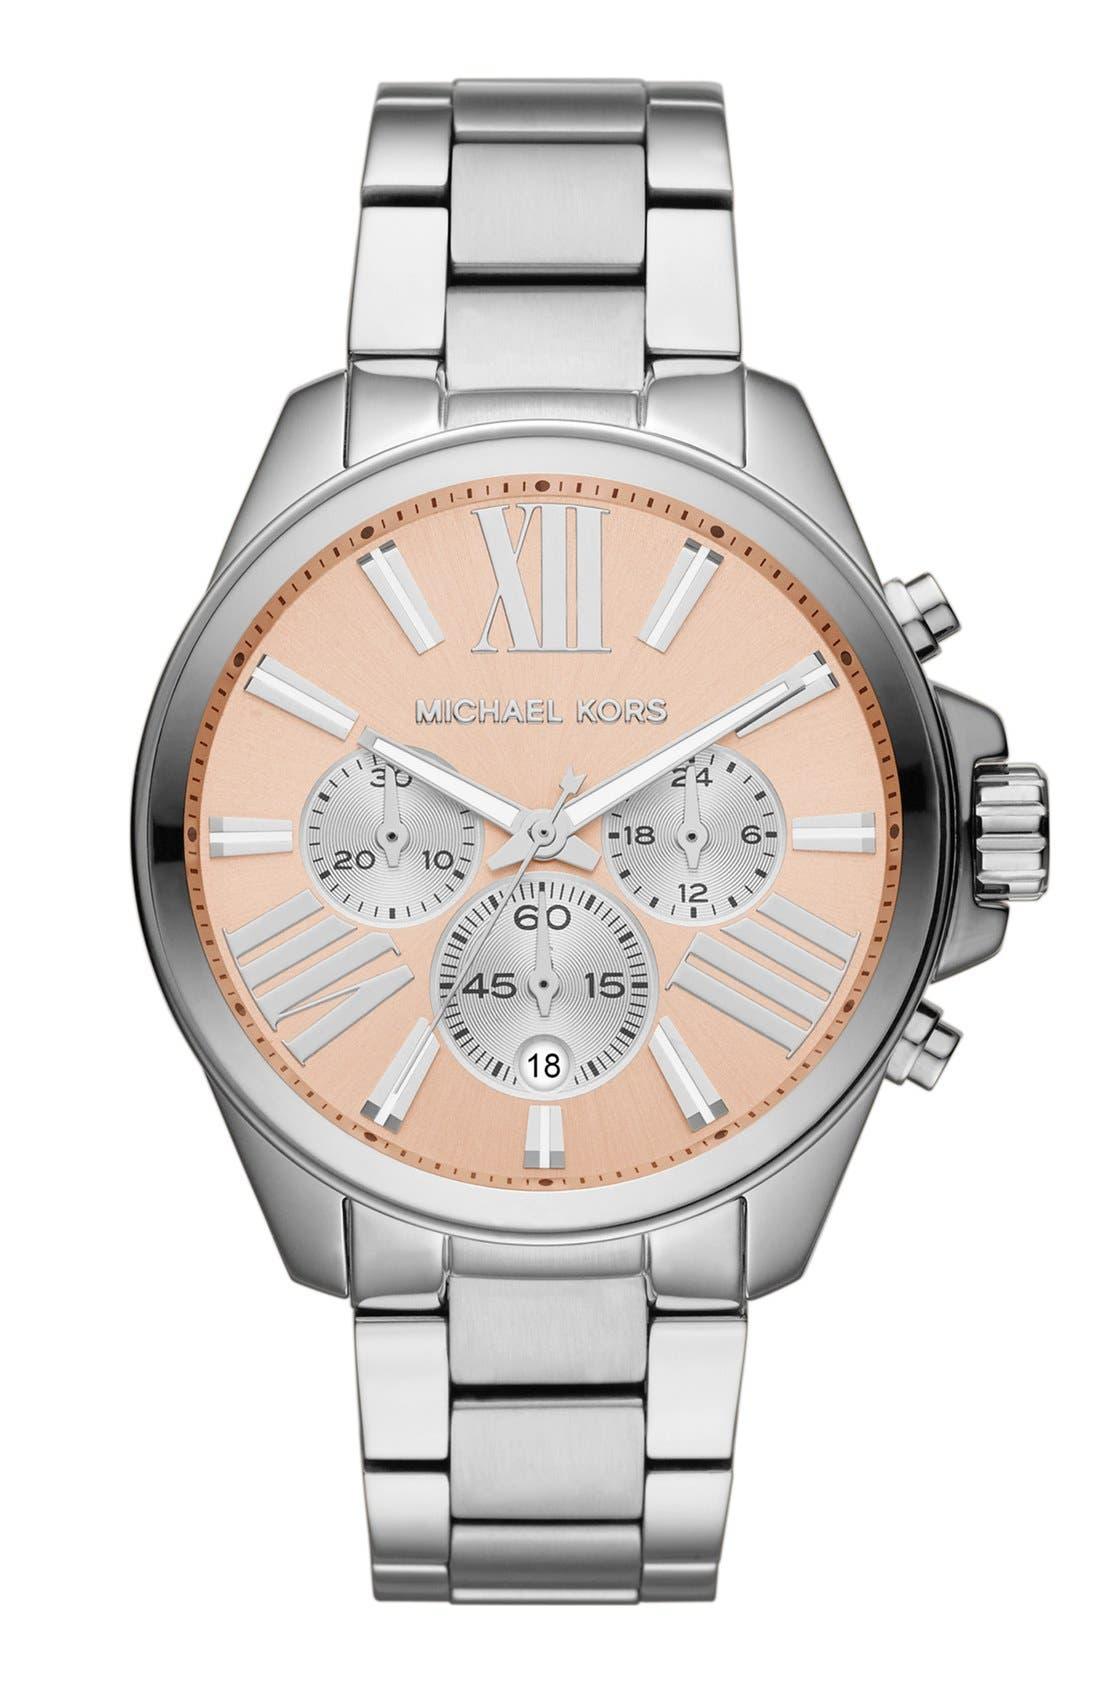 Main Image - Michael Kors 'Wren' Chronograph Bracelet Watch, 42mm